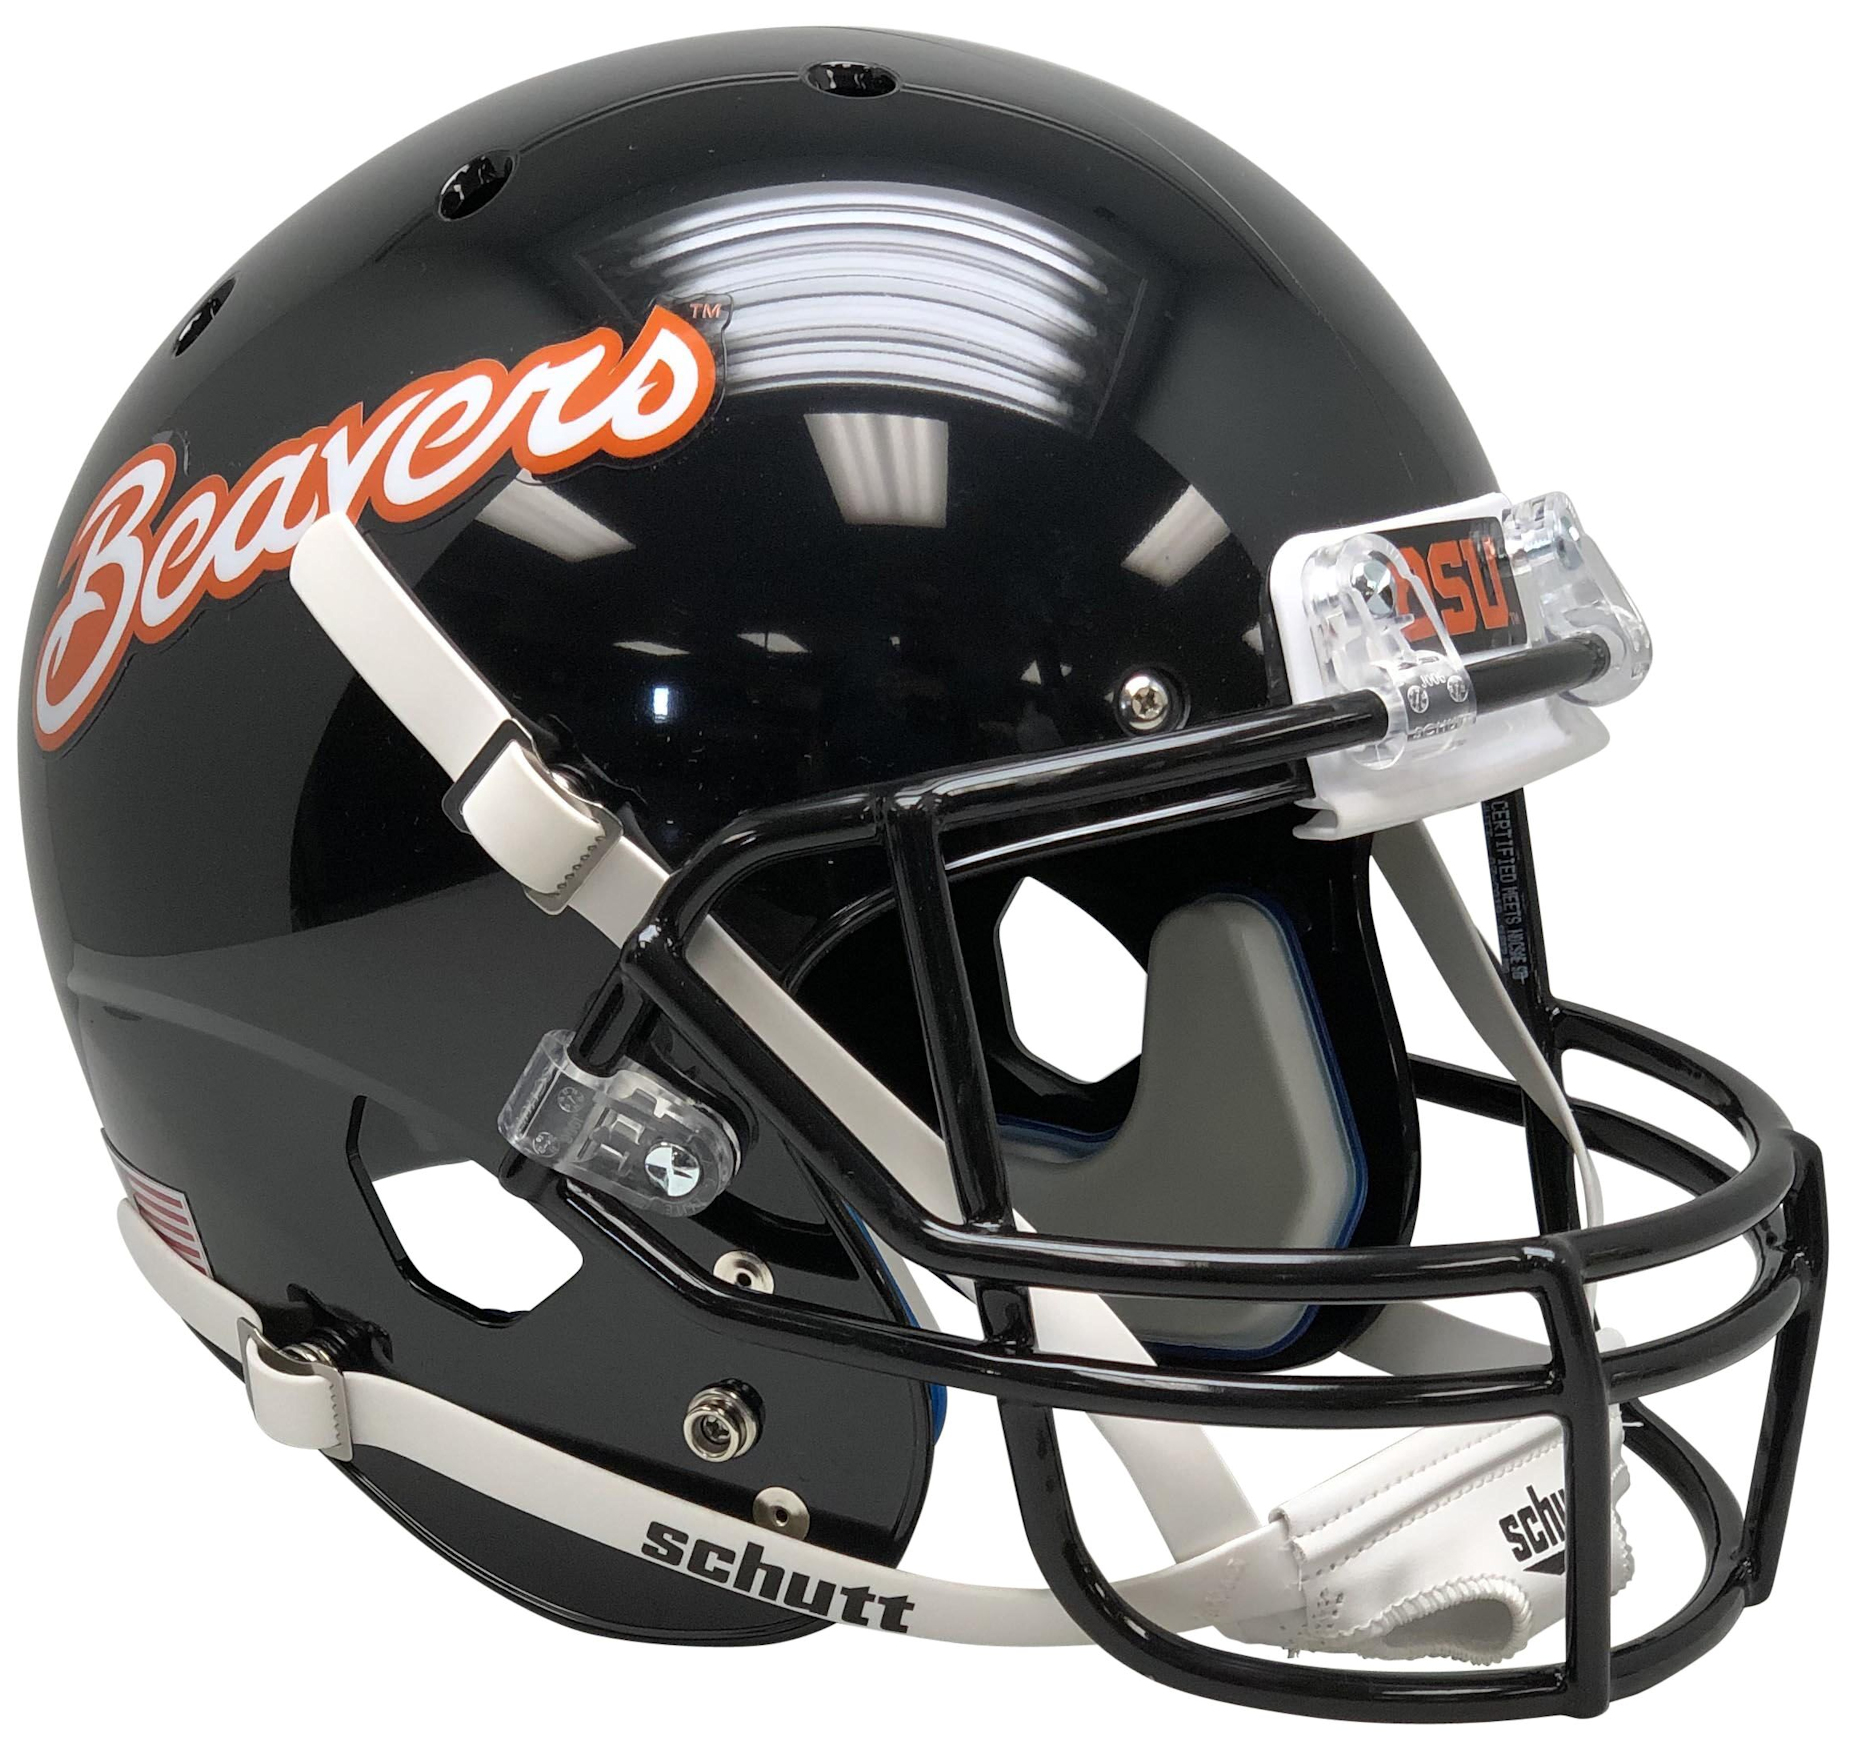 Oregon State Beavers Full XP Replica Football Helmet Schutt <B>Black Beavers</B>